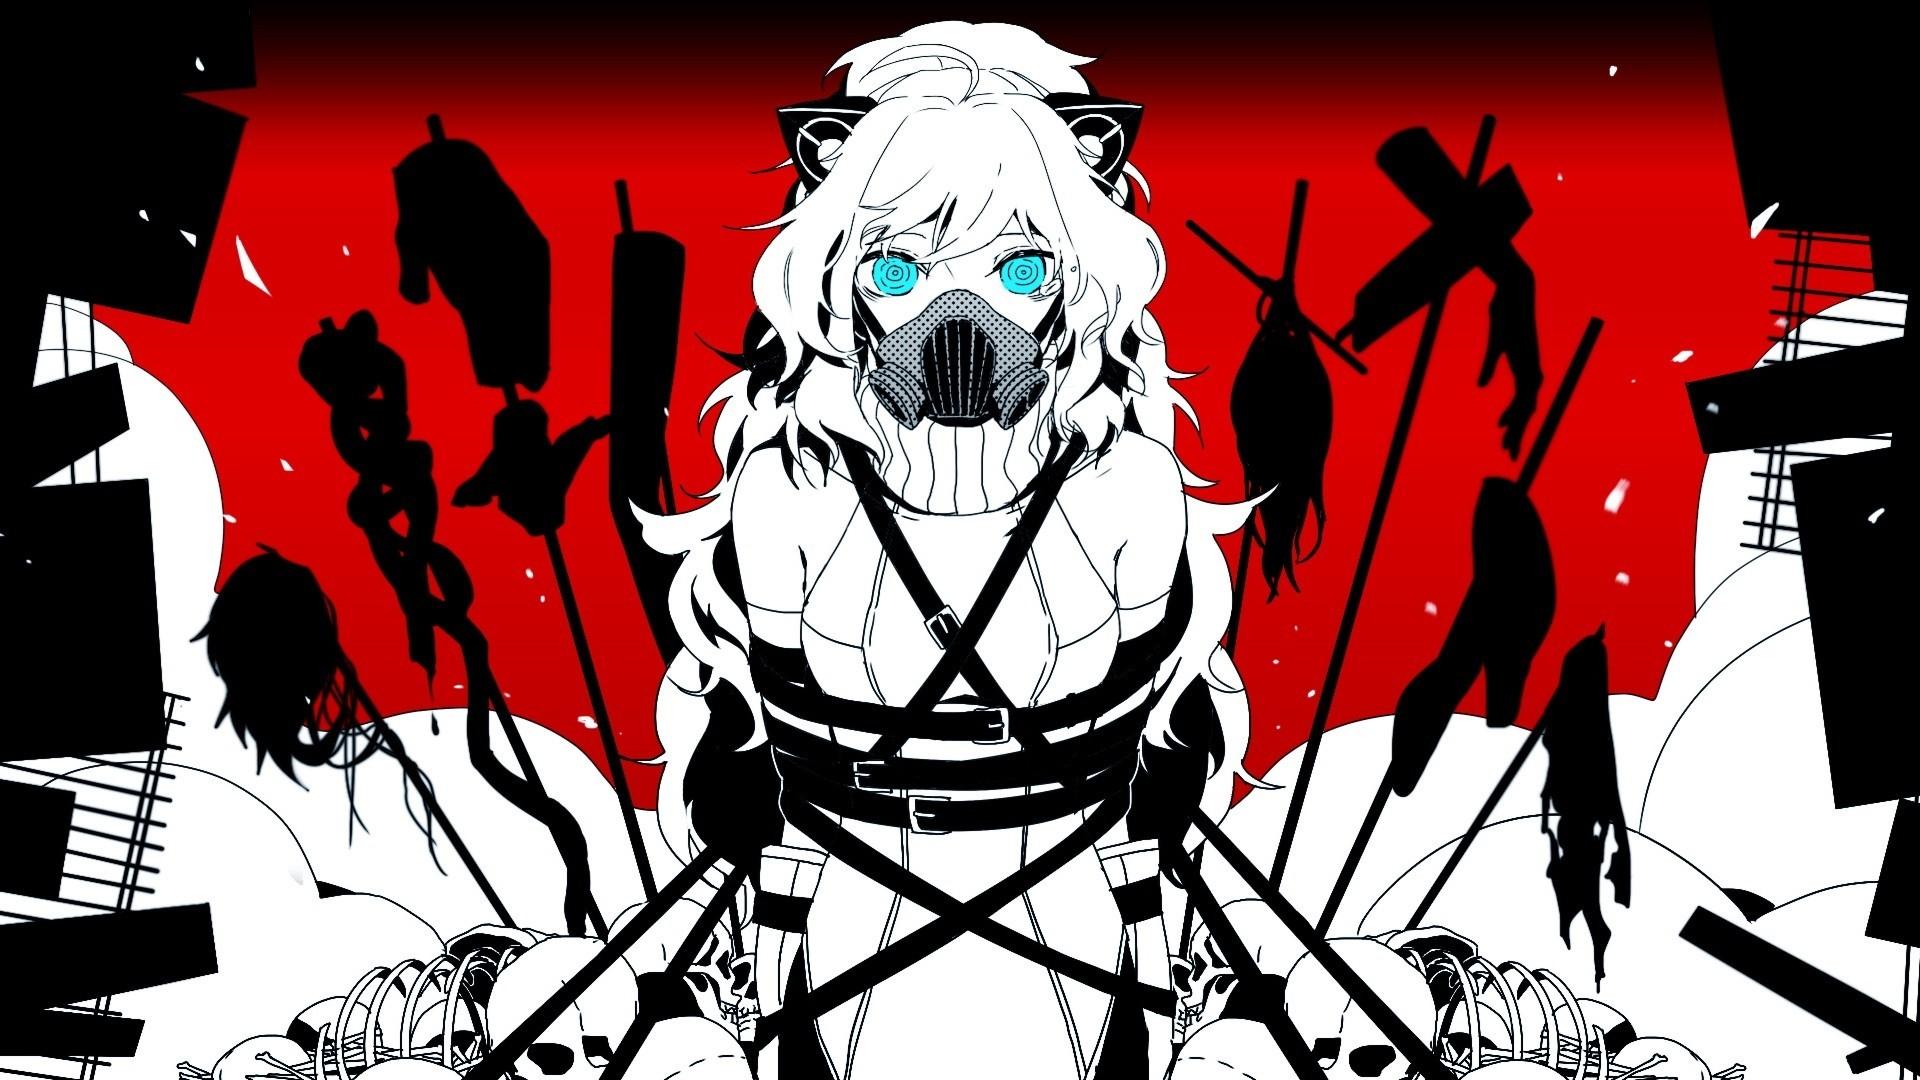 Anime Girl With Gas Mask HD Wallpaper